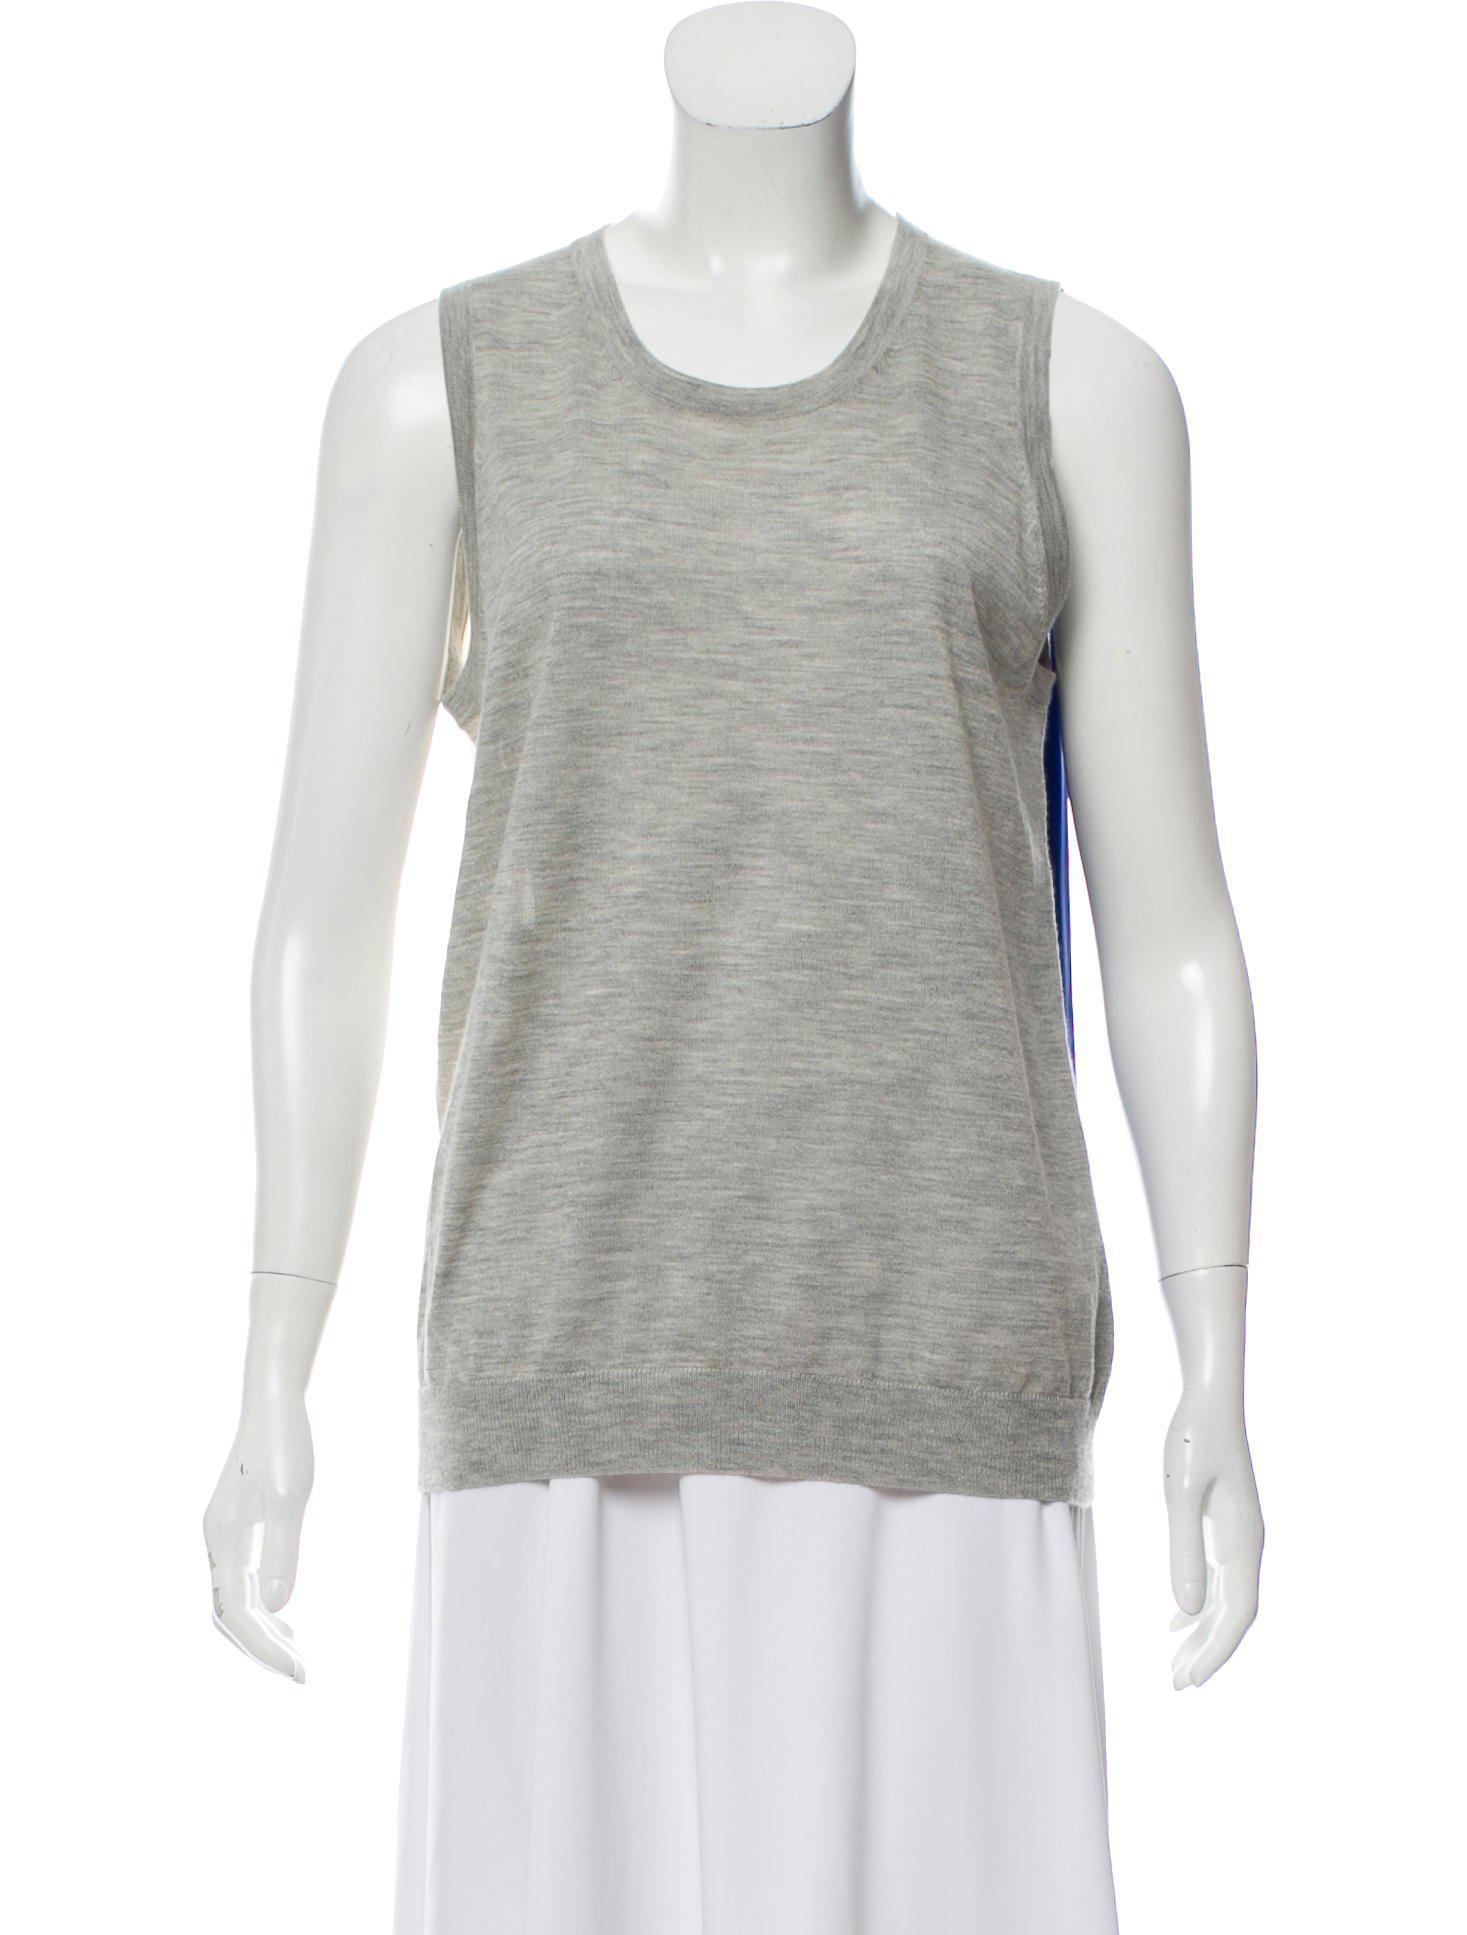 ee340a6e60dfa Lyst - Derek Lam Silk-cashmere Sleeveless Sweater Grey in Gray